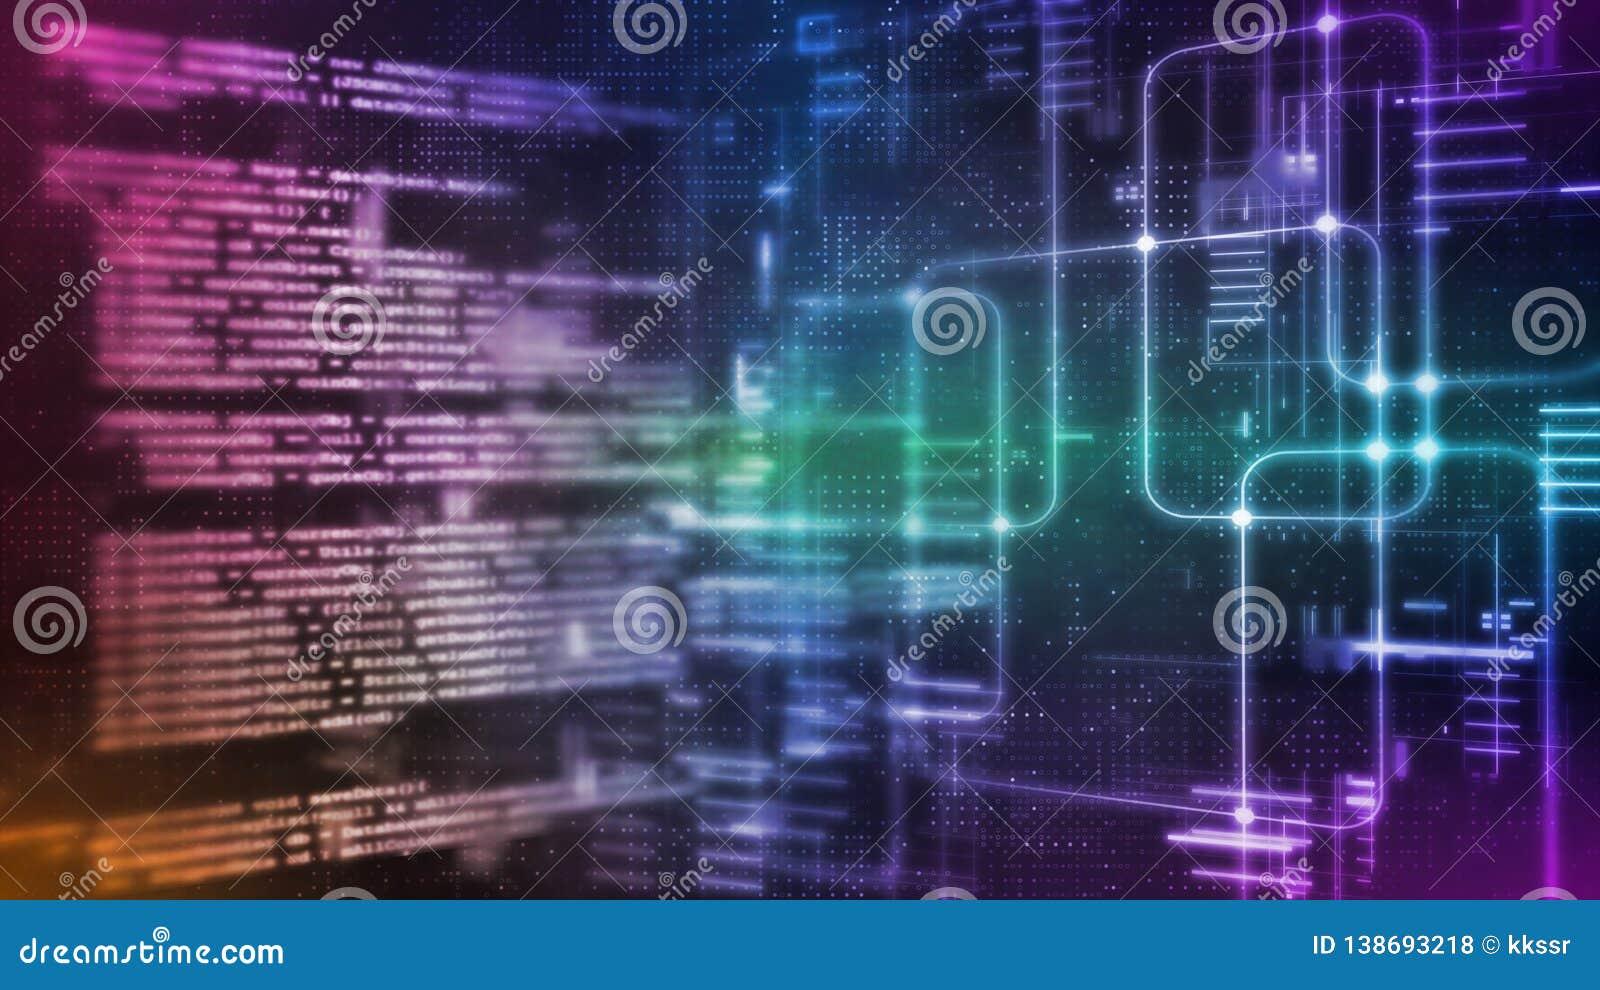 Wiedergabe 3D abstrakter Technologie Digital Binäres Kodierungsstückchen Computer-Software Skriptes auf Datenwissenschafts-System